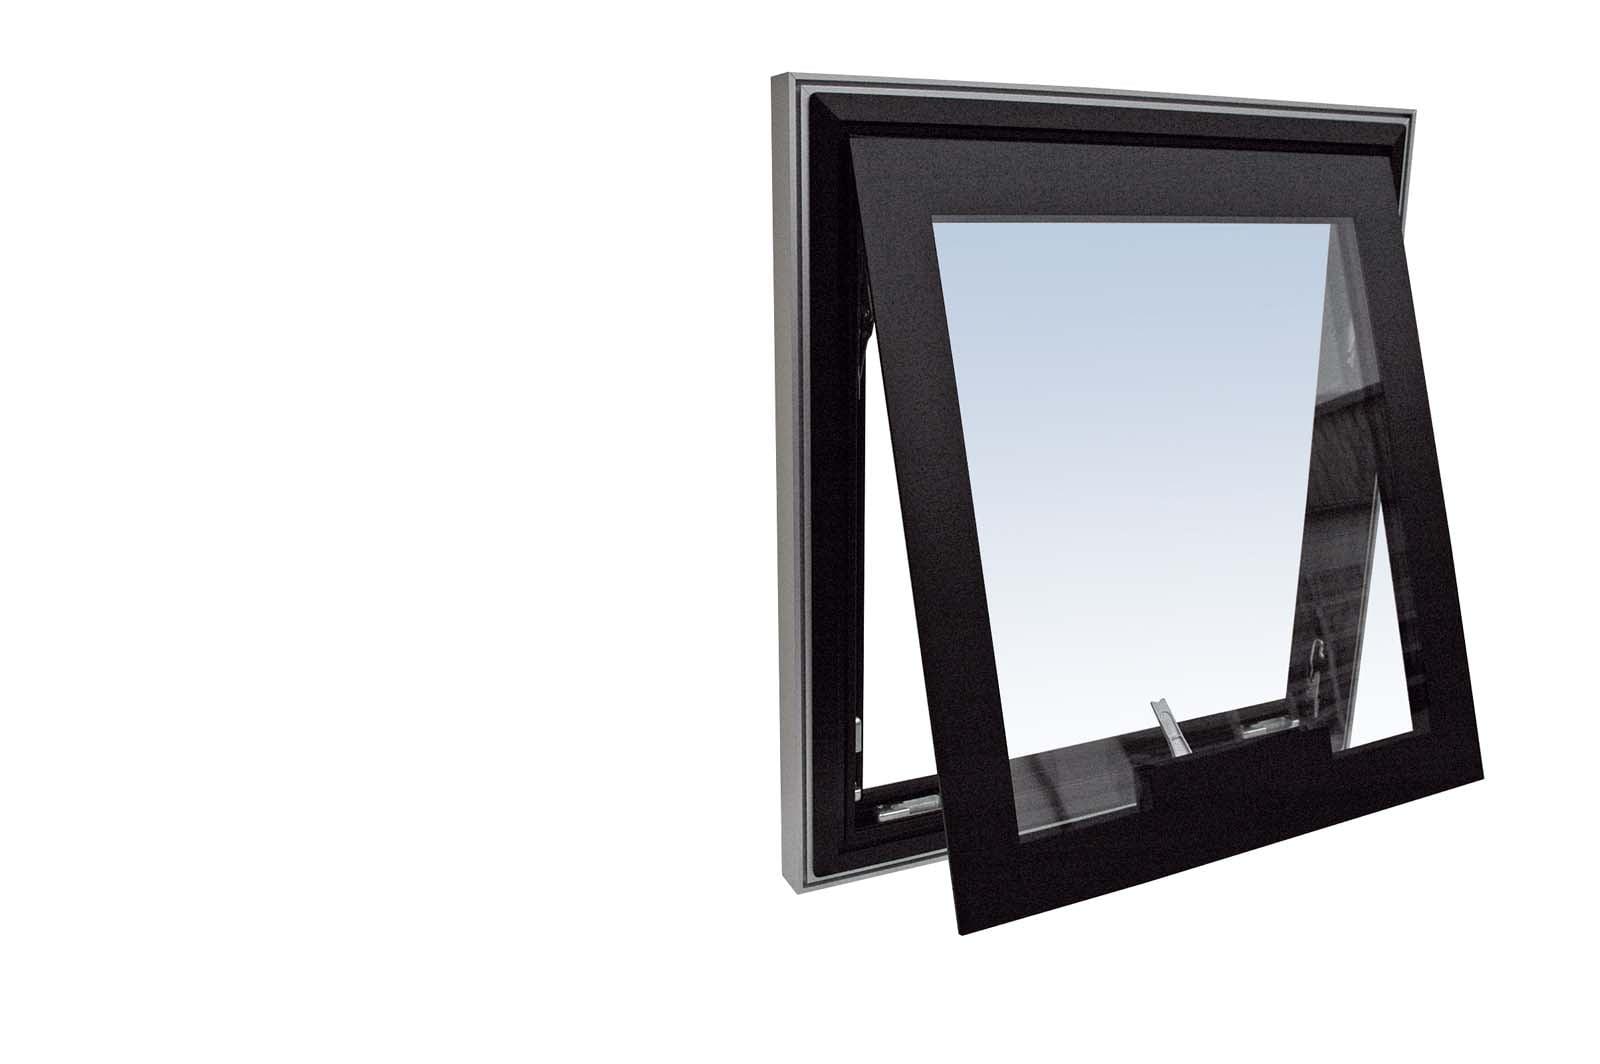 Aufbau Dometic Kühlschrank : Dometic kühlschrank rm mes anschlag links u huppertz